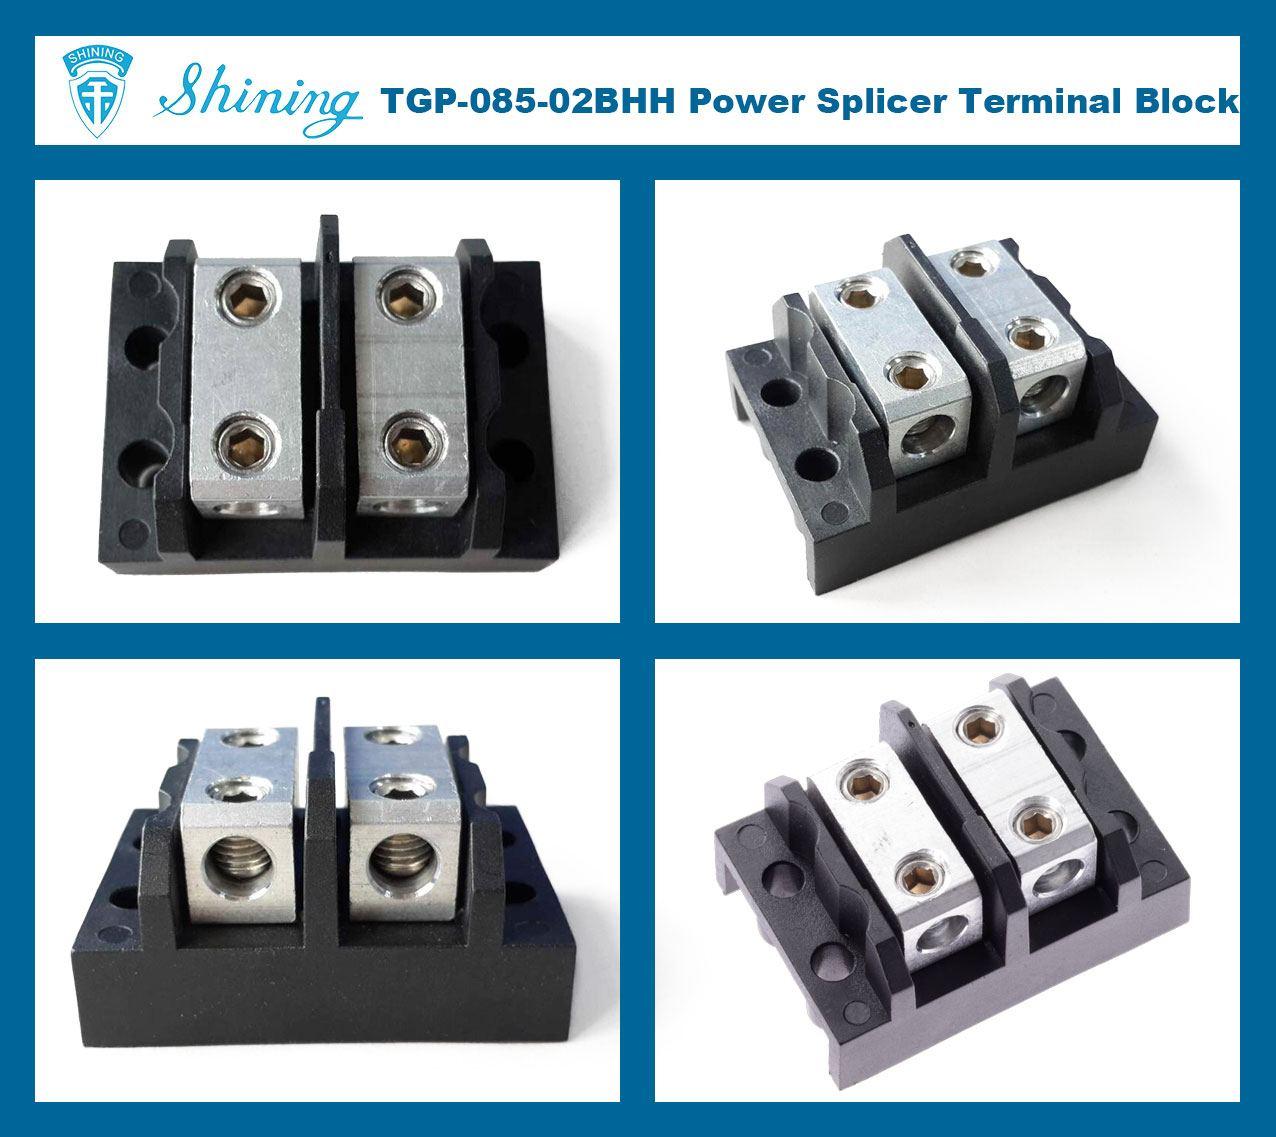 TGP-085-02BHH 600V 85A 2 Way Power Splicer Terminal Block